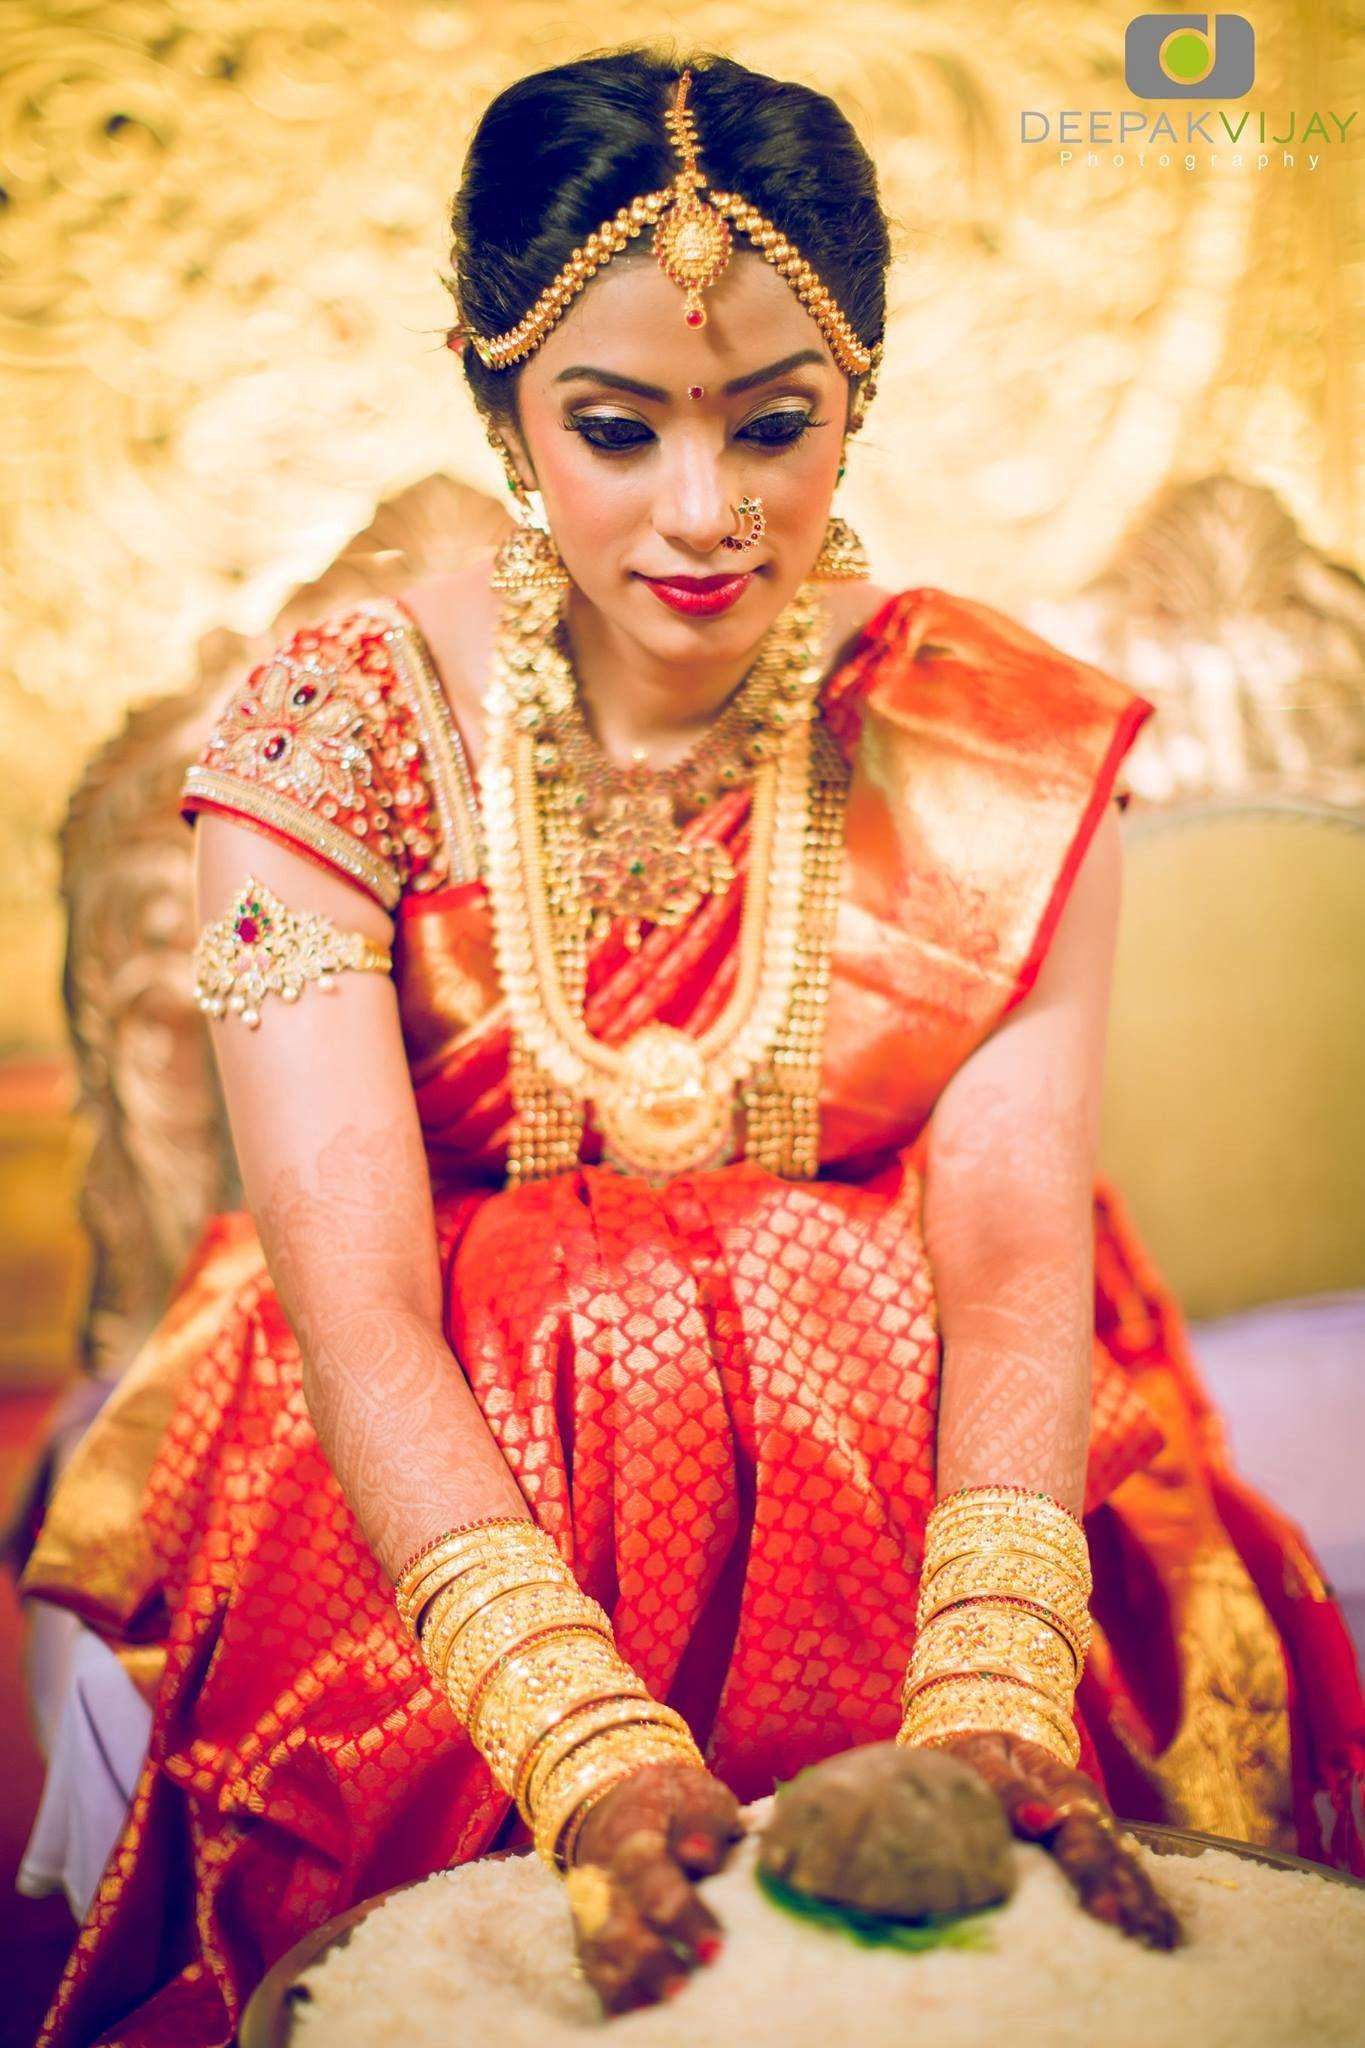 Kerala wedding reception dresses for the bride  Pin by Miguel Candelaria on ramya sri  Pinterest  Wedding Bride